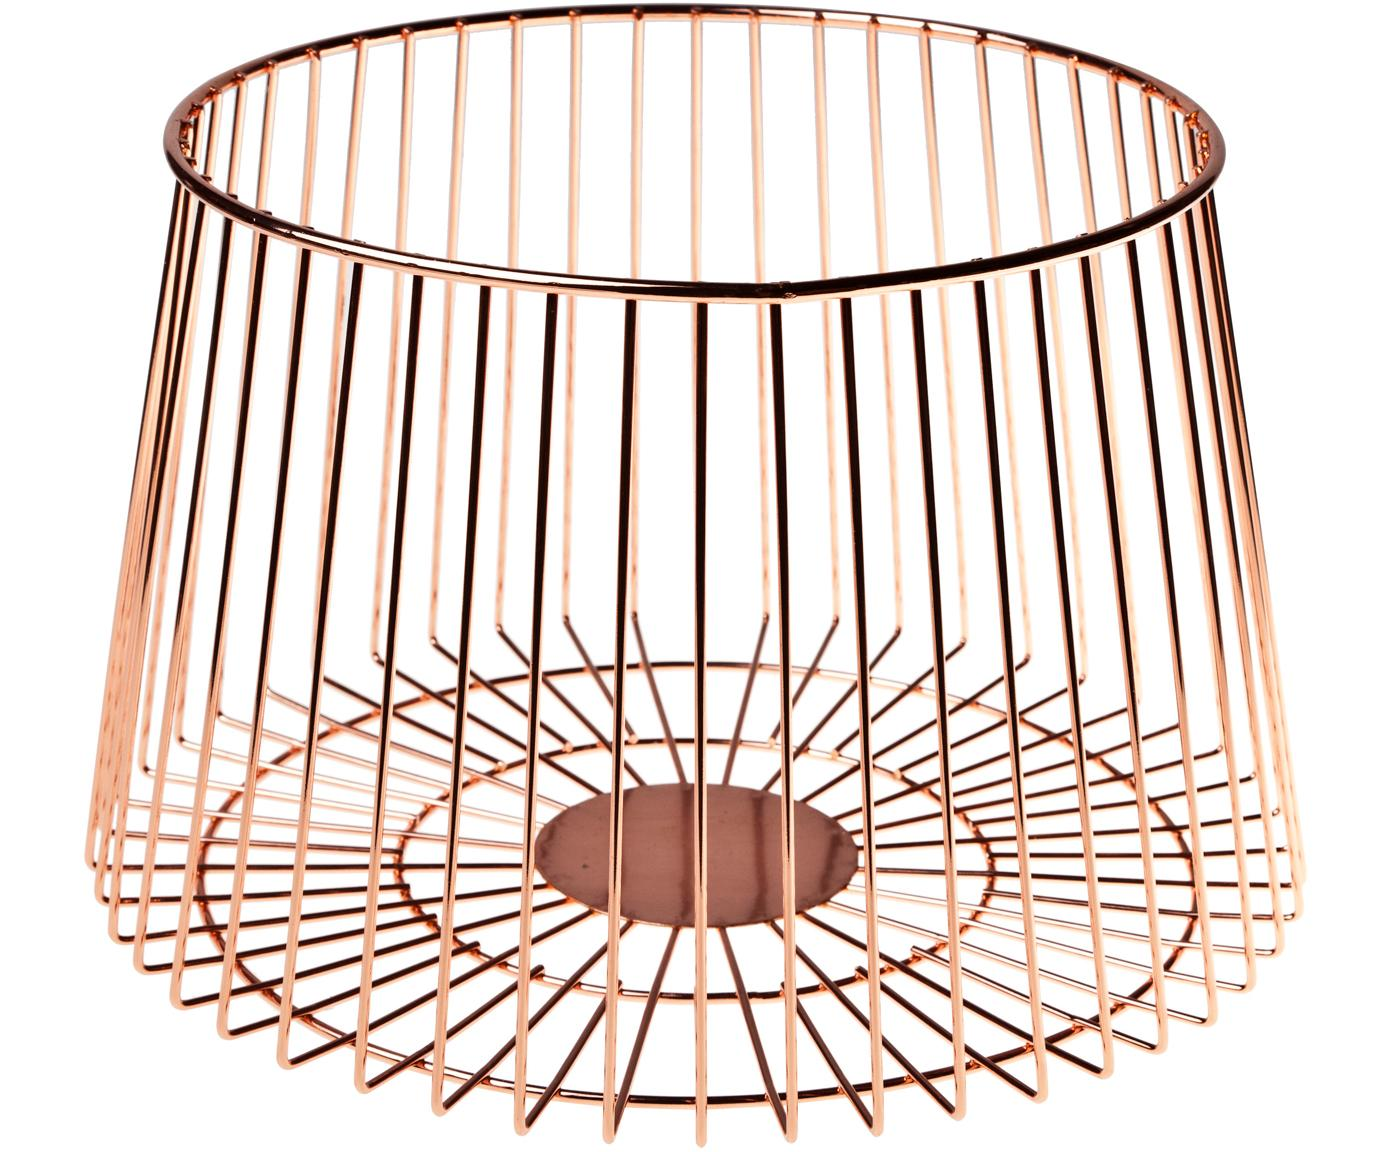 Cesta Basket, Acero inoxidable, recubierto., Color bronce, Ø 24 x Al 16 cm